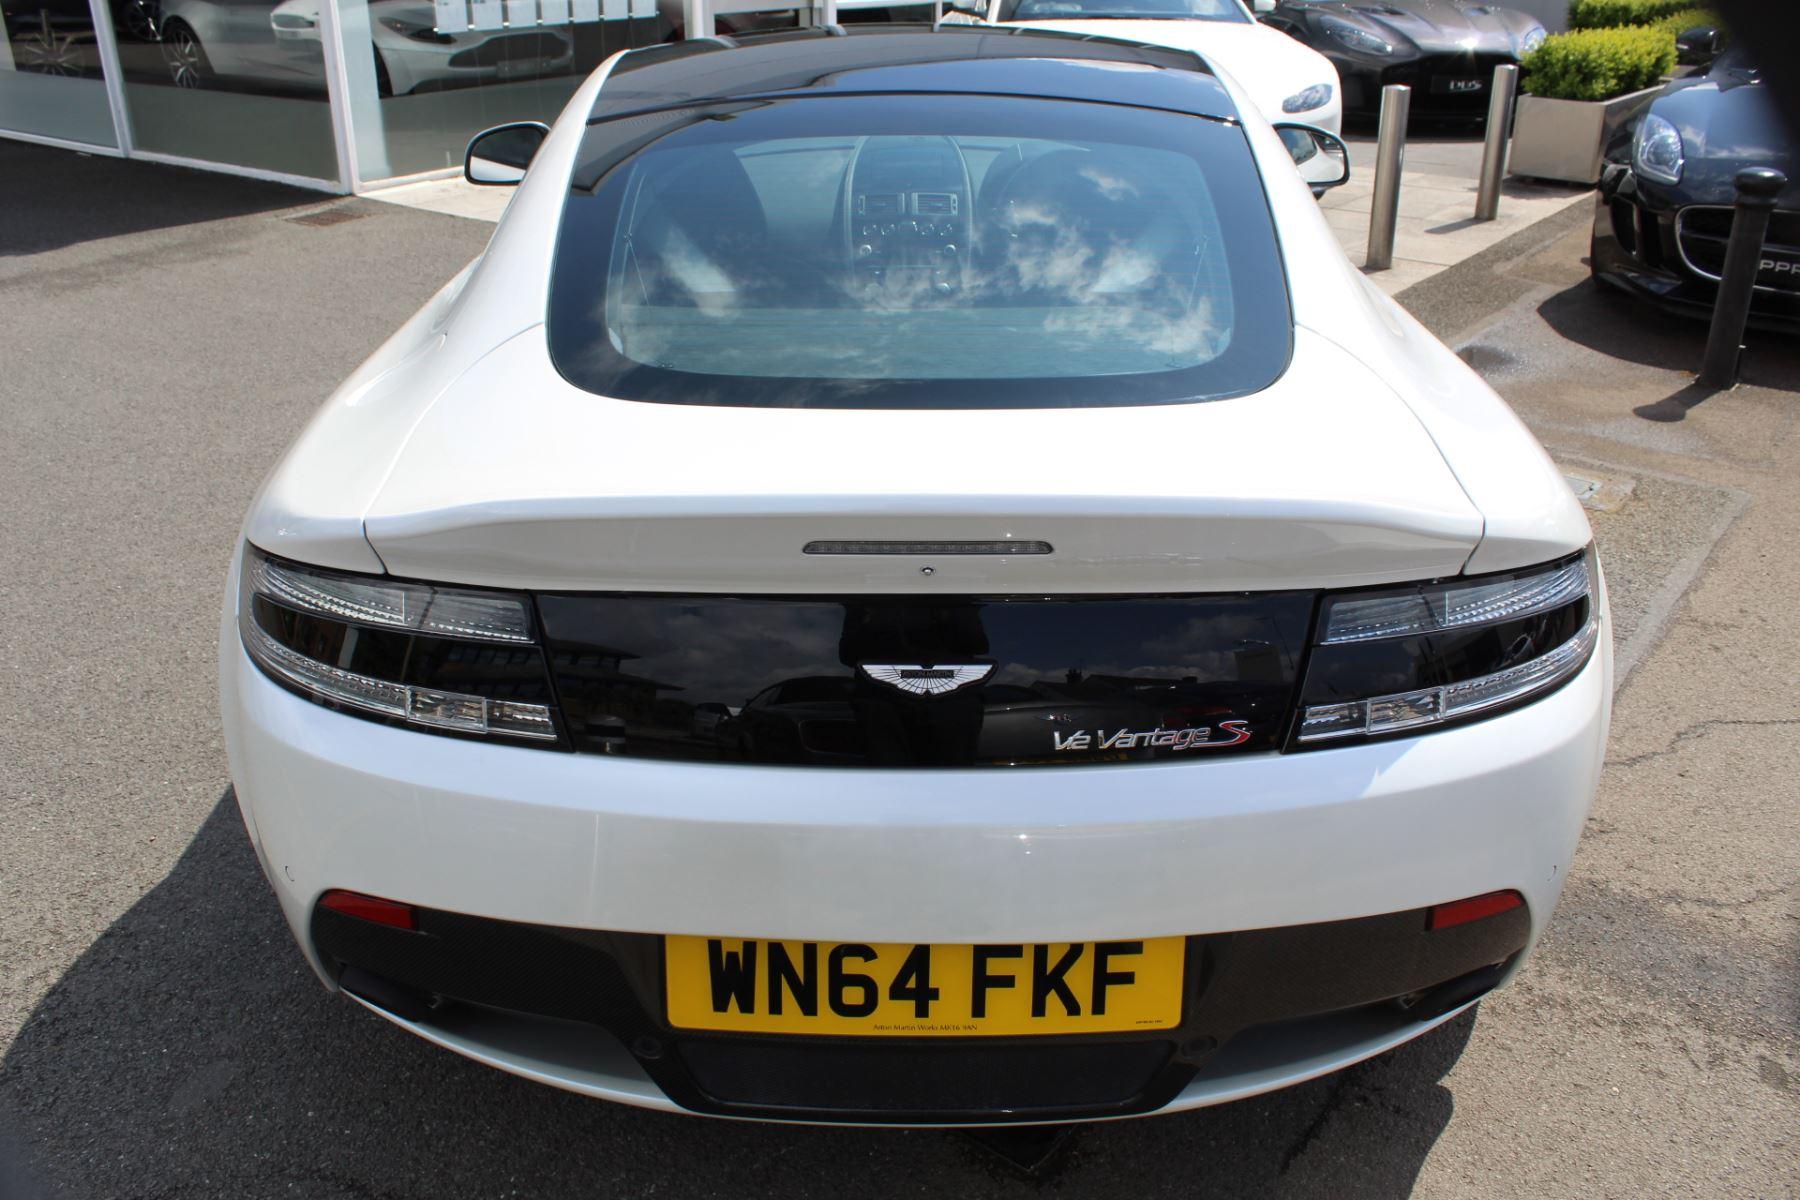 Aston Martin V12 Vantage S Coupe S 2dr Sportshift III image 22